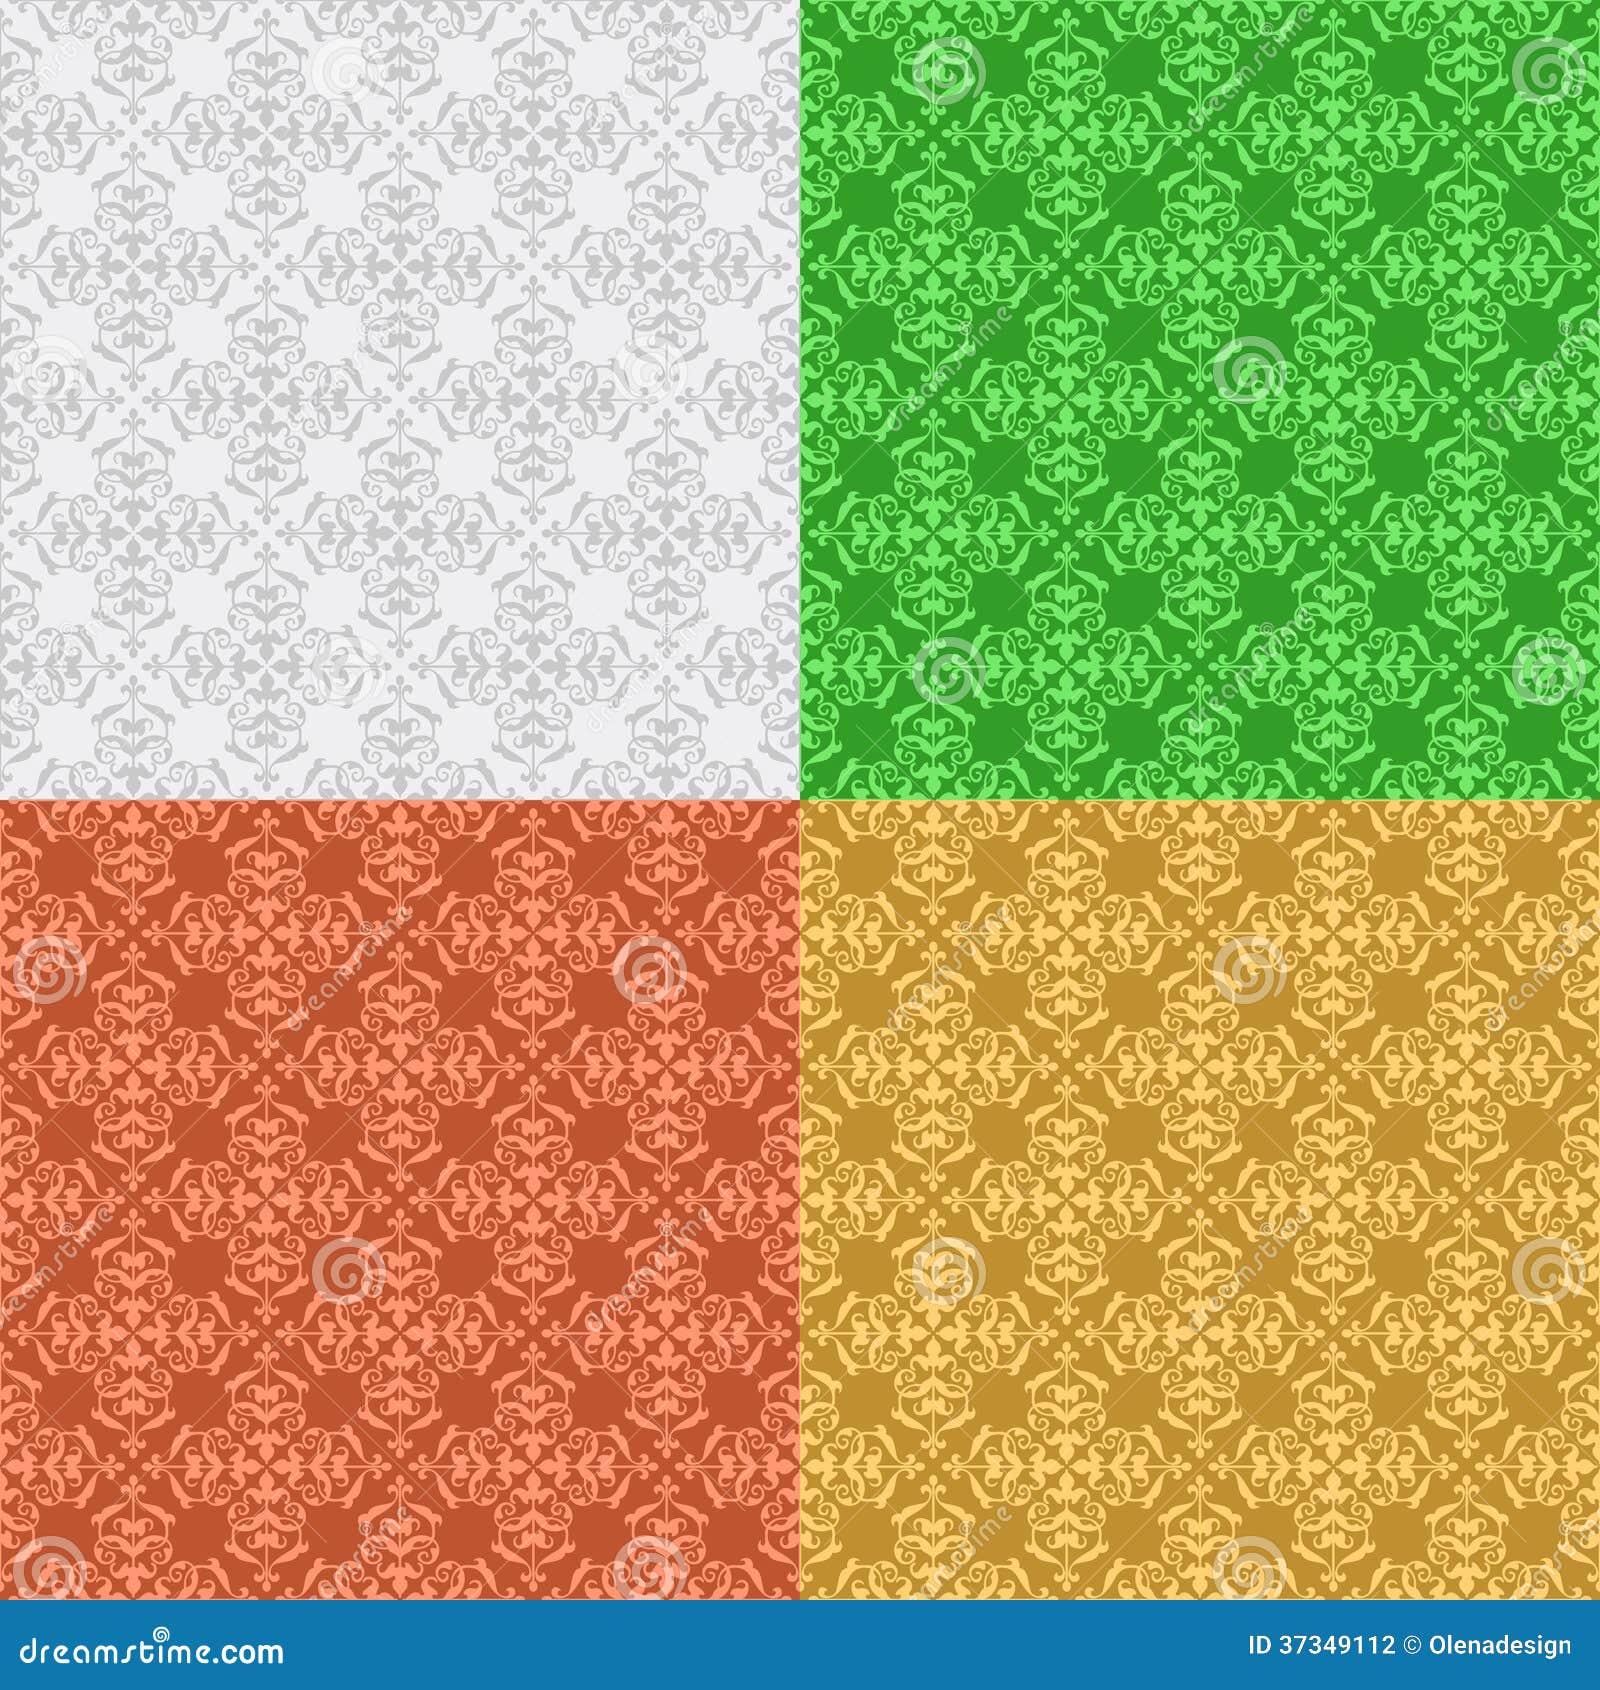 Set - vector decorative seamless patterns